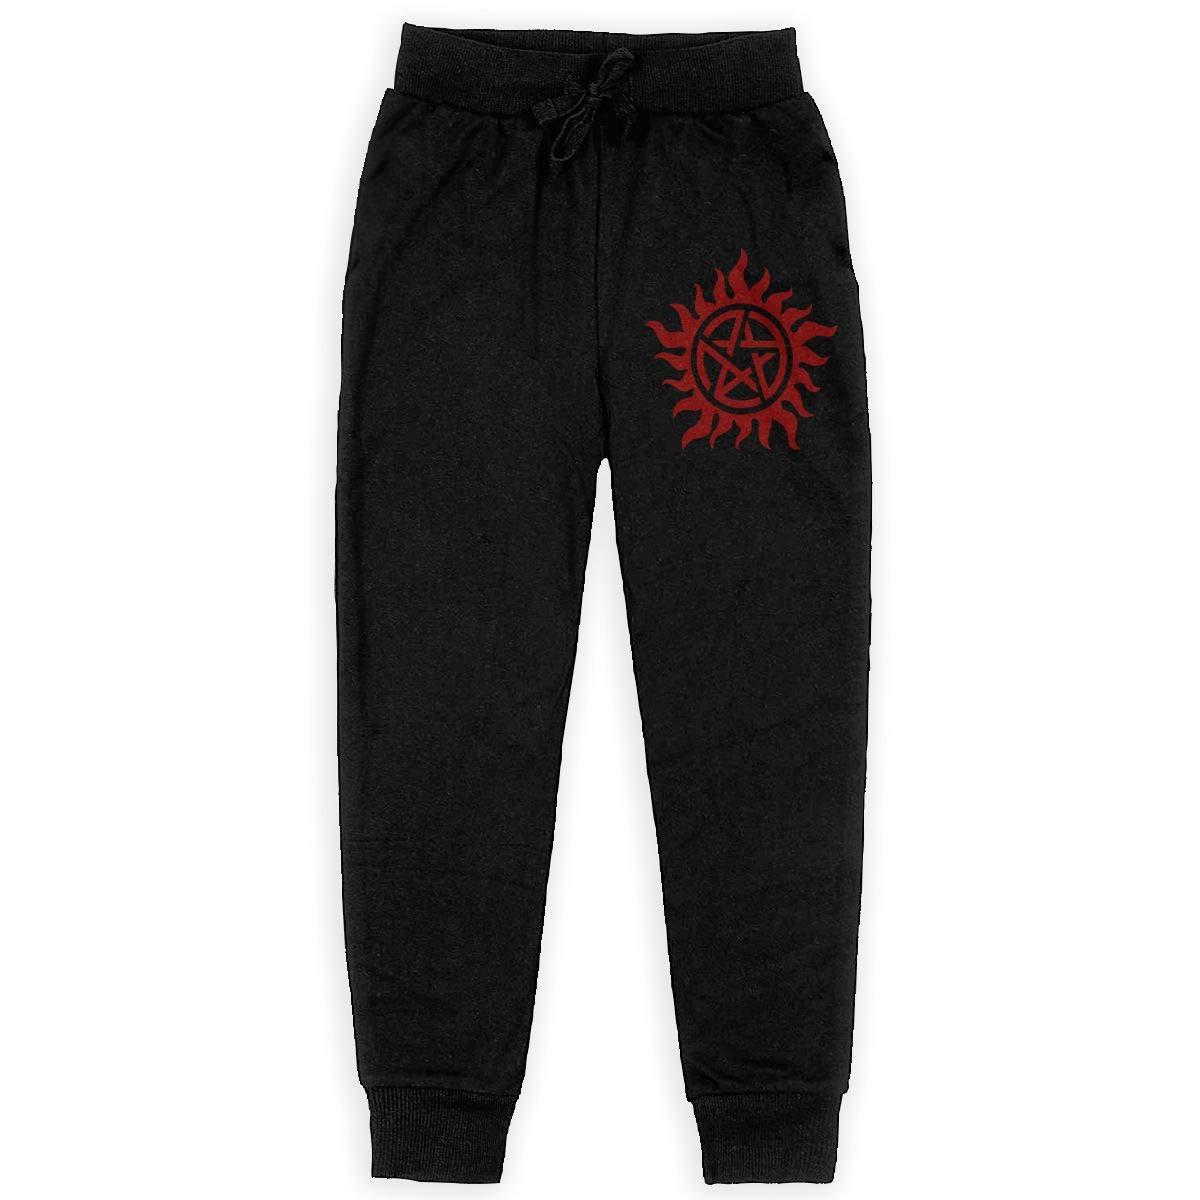 WYZVK22 Supernatural Soft//Cozy Sweatpants Teenager Fleece Pants for Teen Girls